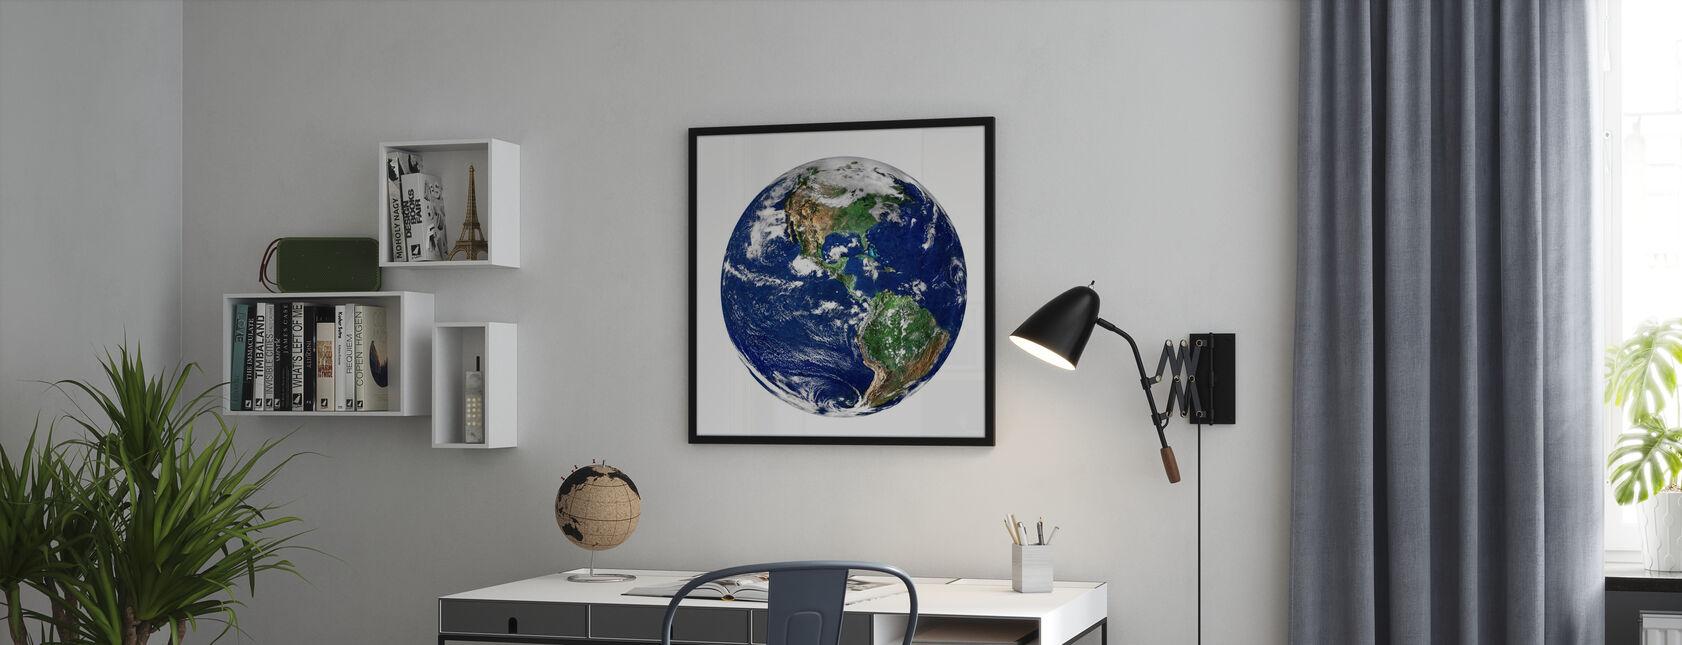 Globe - Impression encadree - Bureau